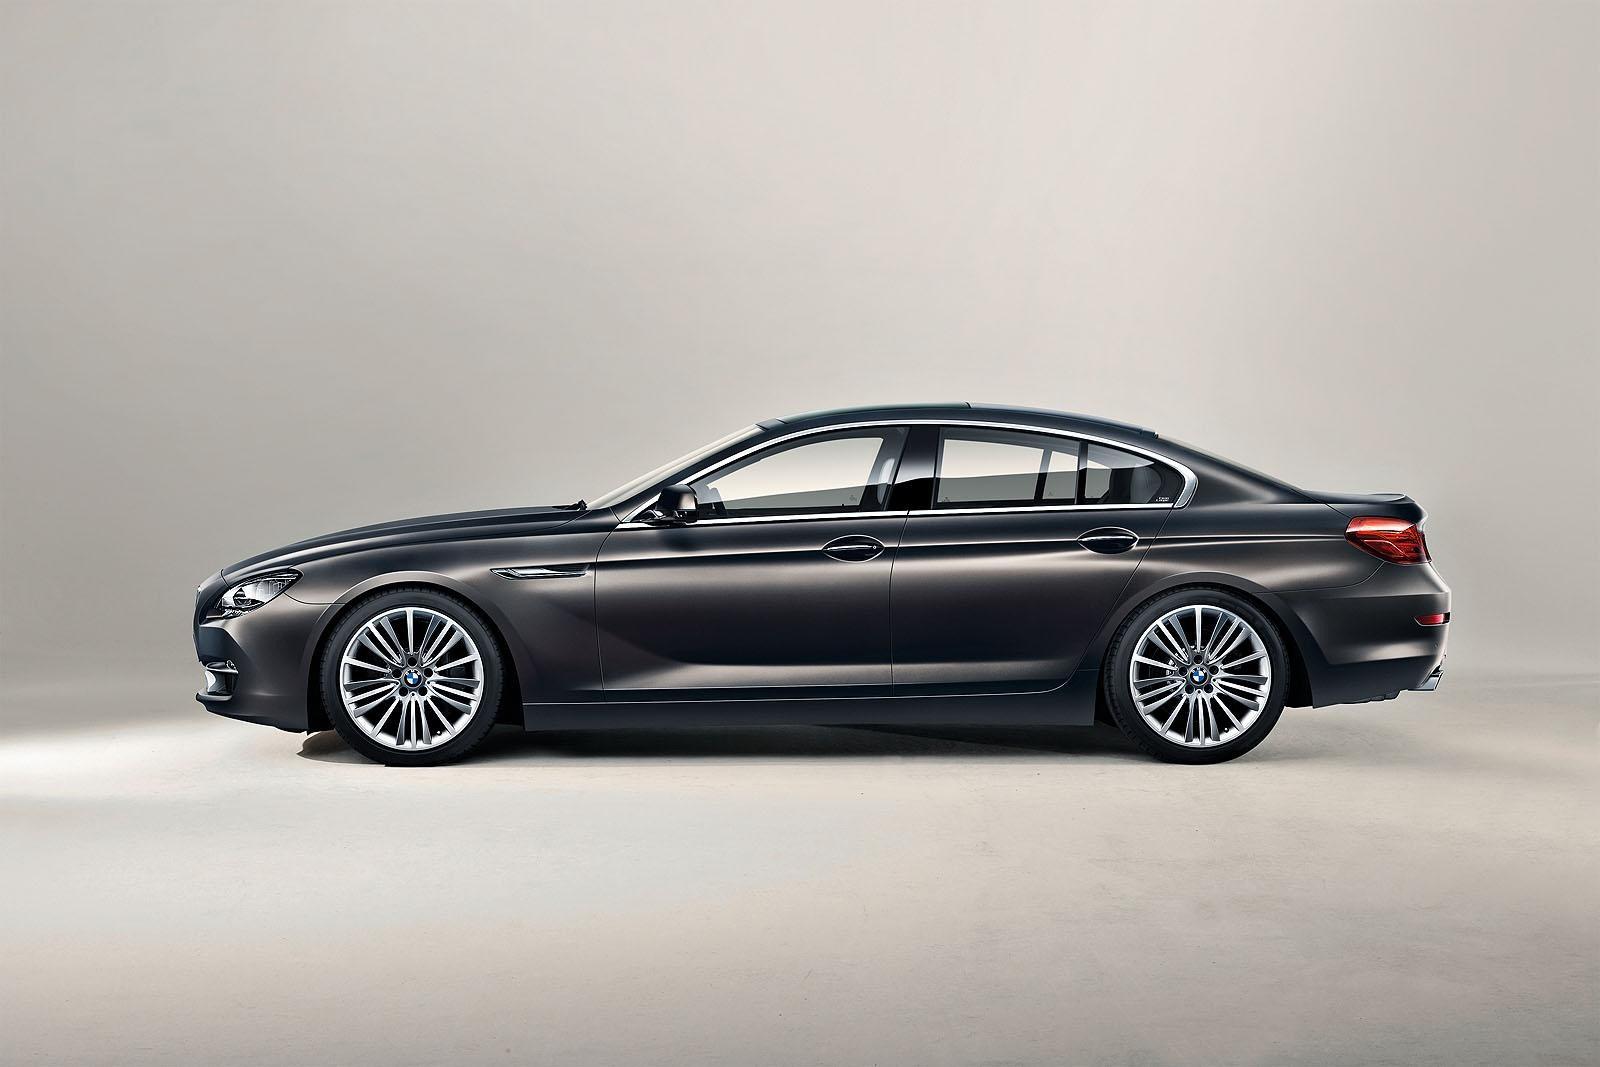 2014 BMW 2-Series Gran Coupe Car Prices, Spy Photos - PI Walls